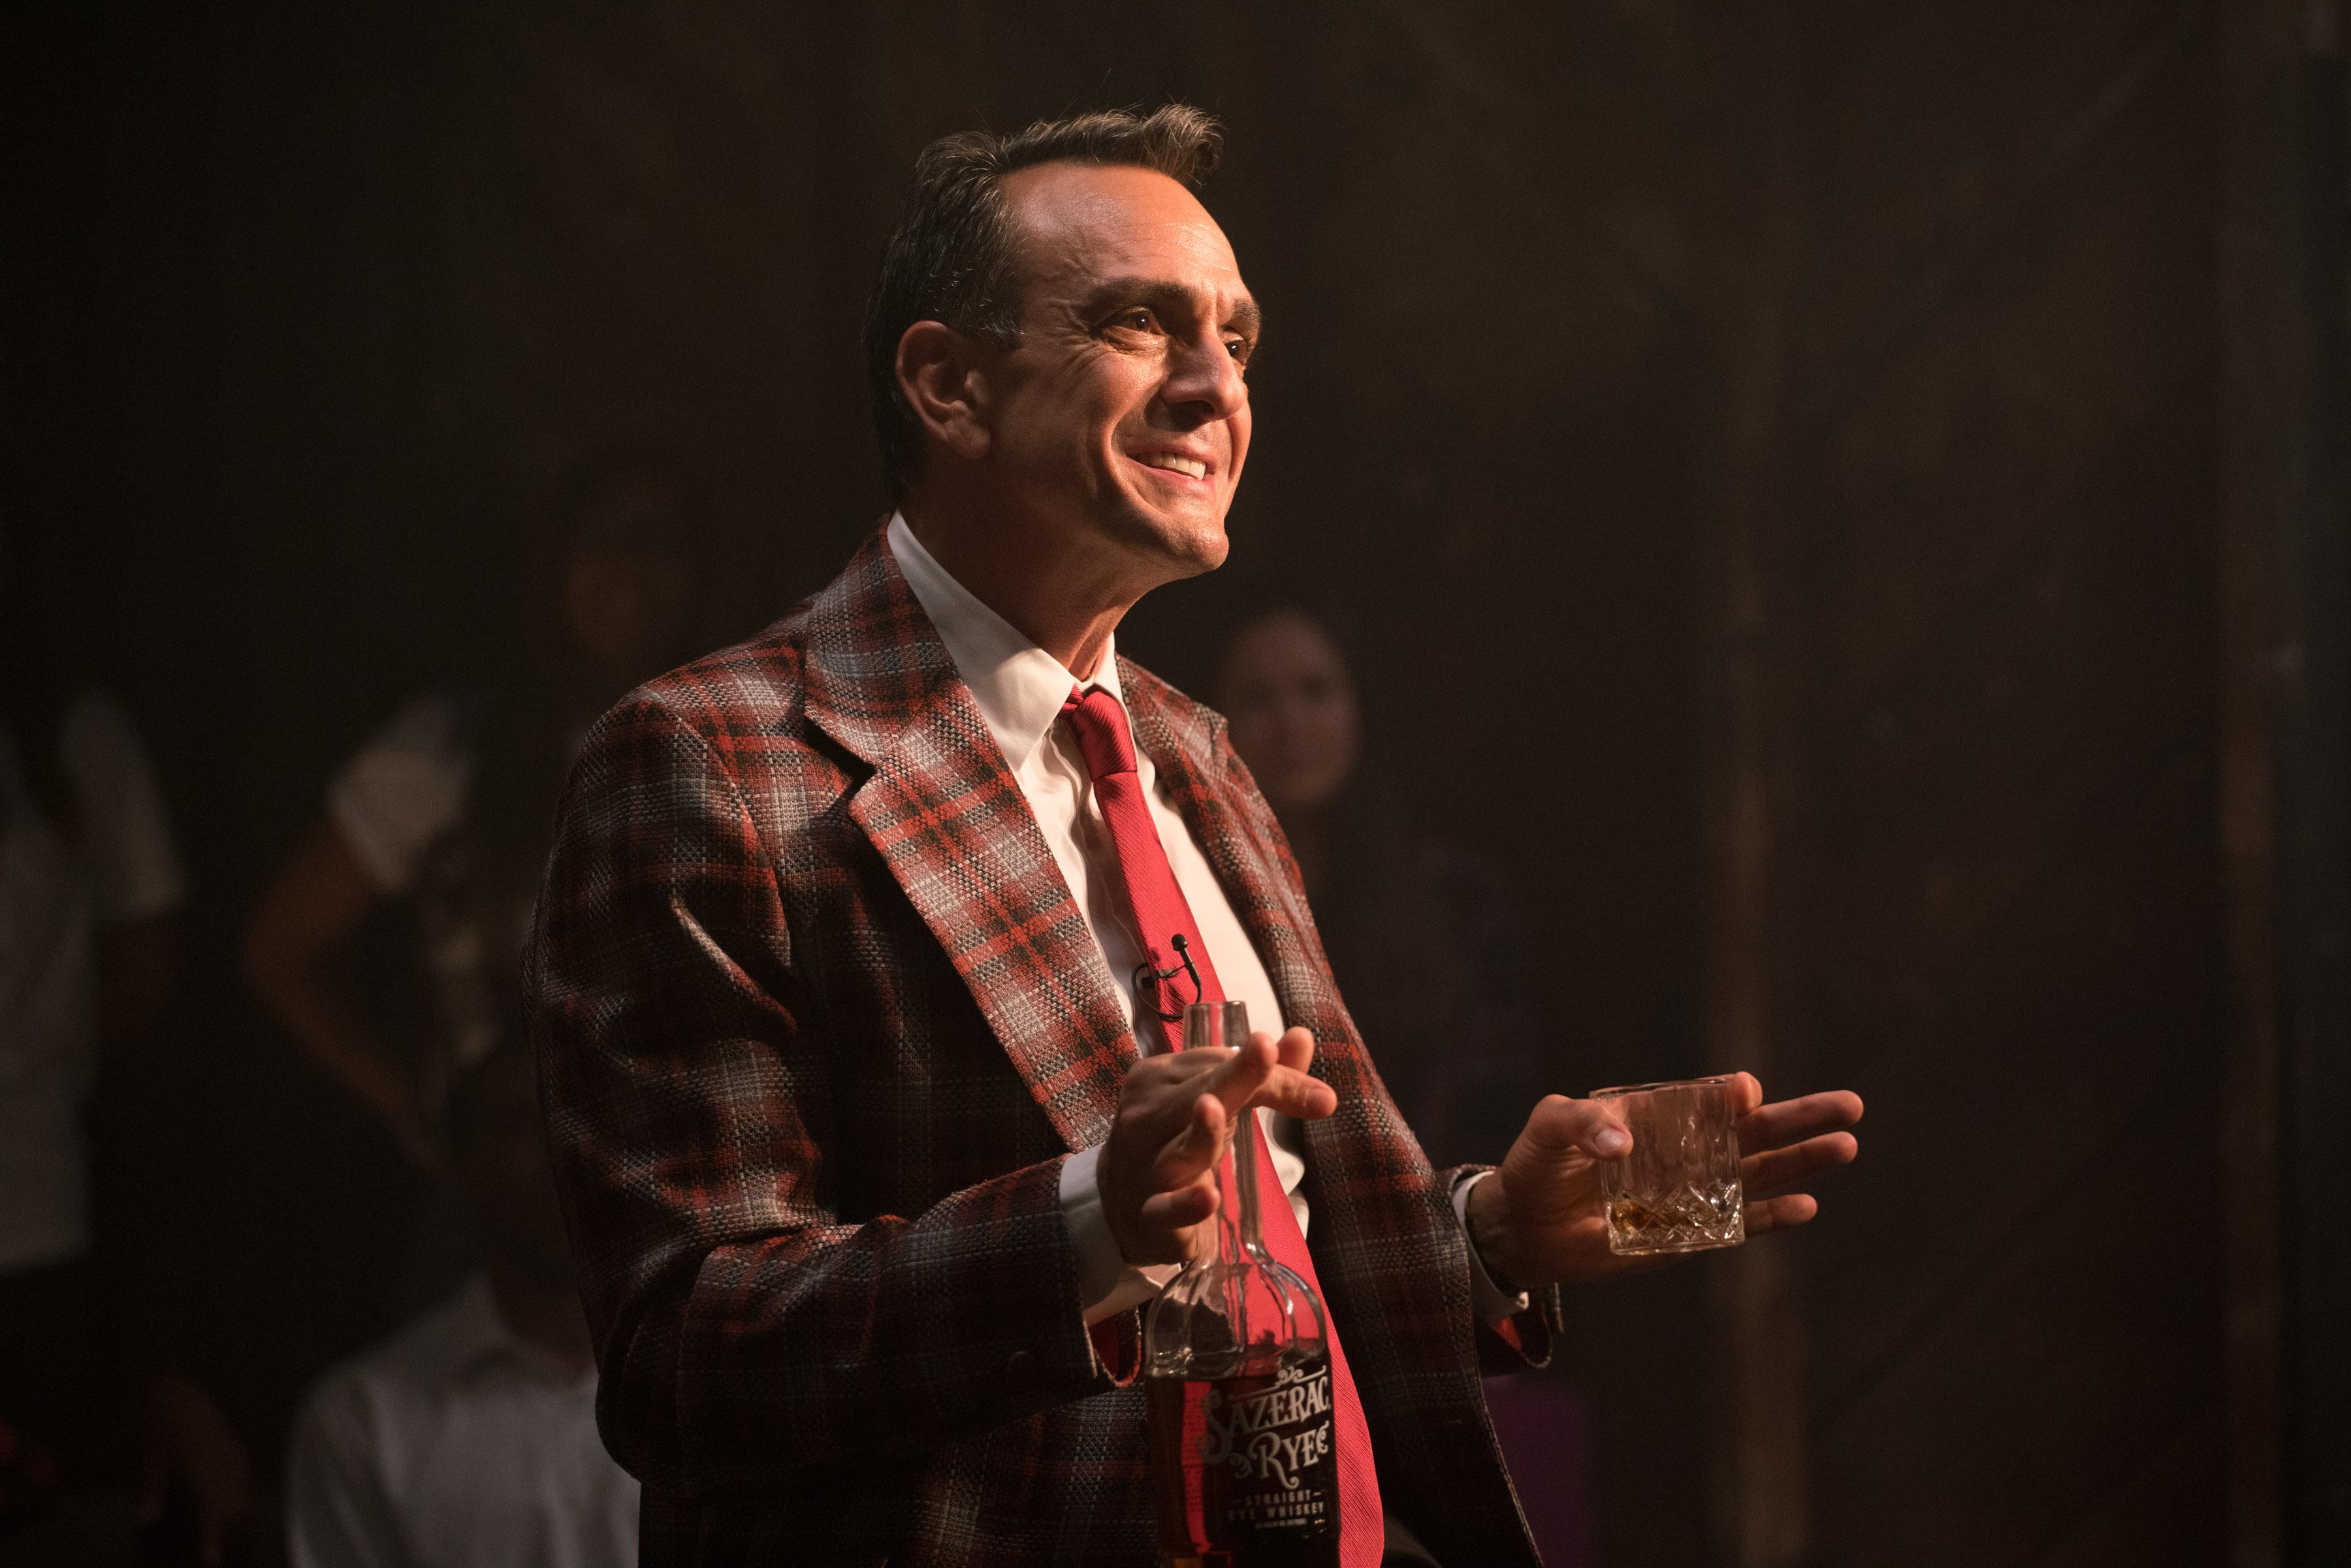 Brockmire Season 2 Review Ifc Show Makes Hank Azaria Feel